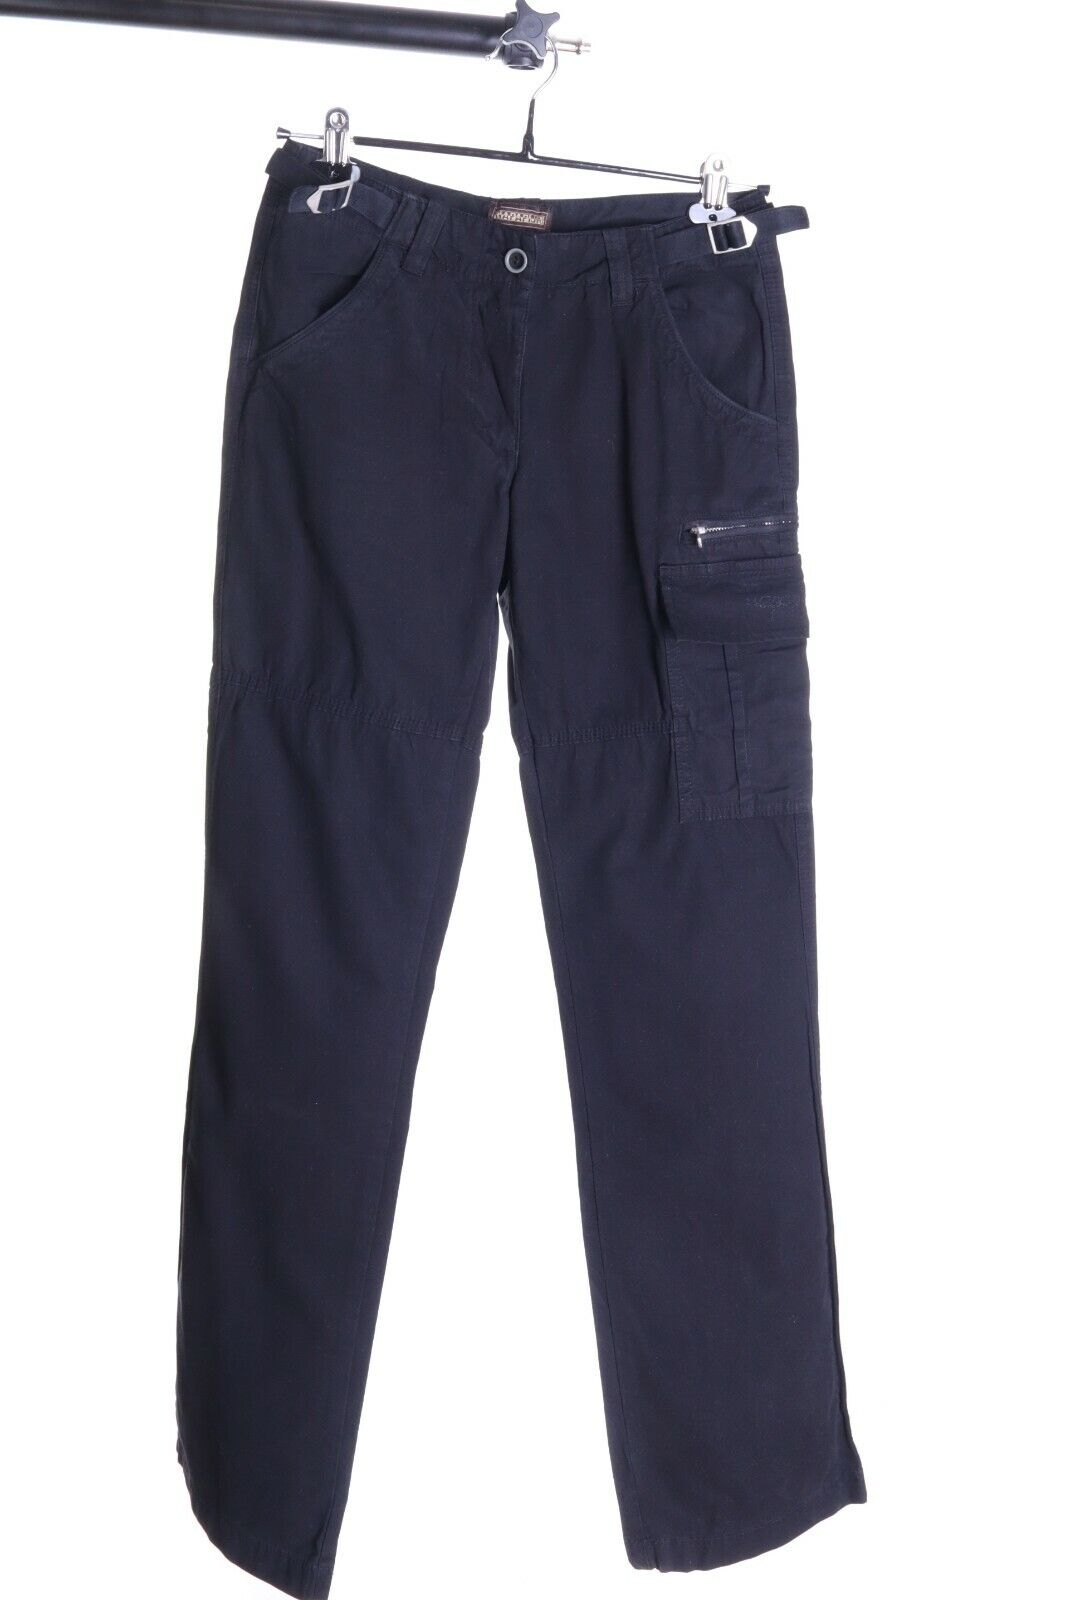 Damen Napapijri Schwarz 100% Baumwolle Cargohose Größe 40